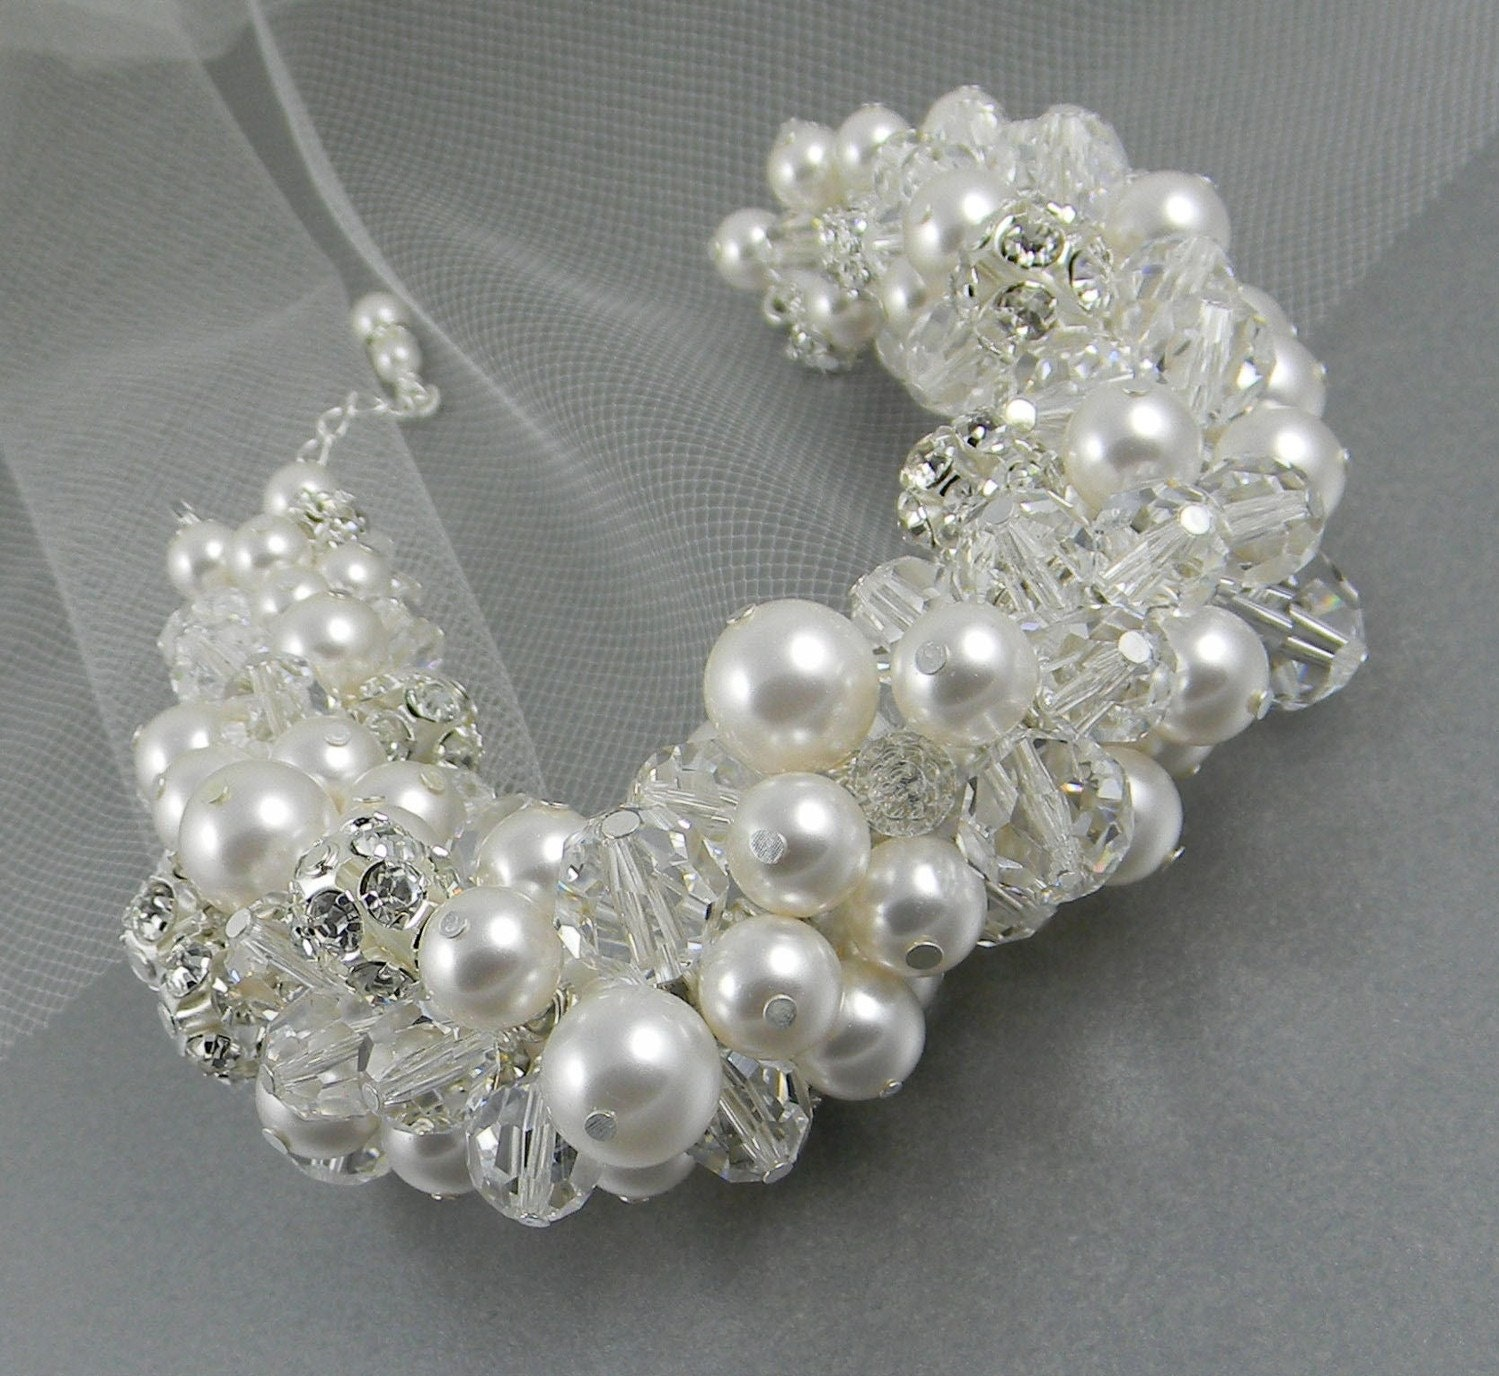 Chunky Bridal Bracelet, Pearl Wedding Bracelet, Swarovski Pearls, Swarovski crystals, rhinestones, Antoinette Bracelet